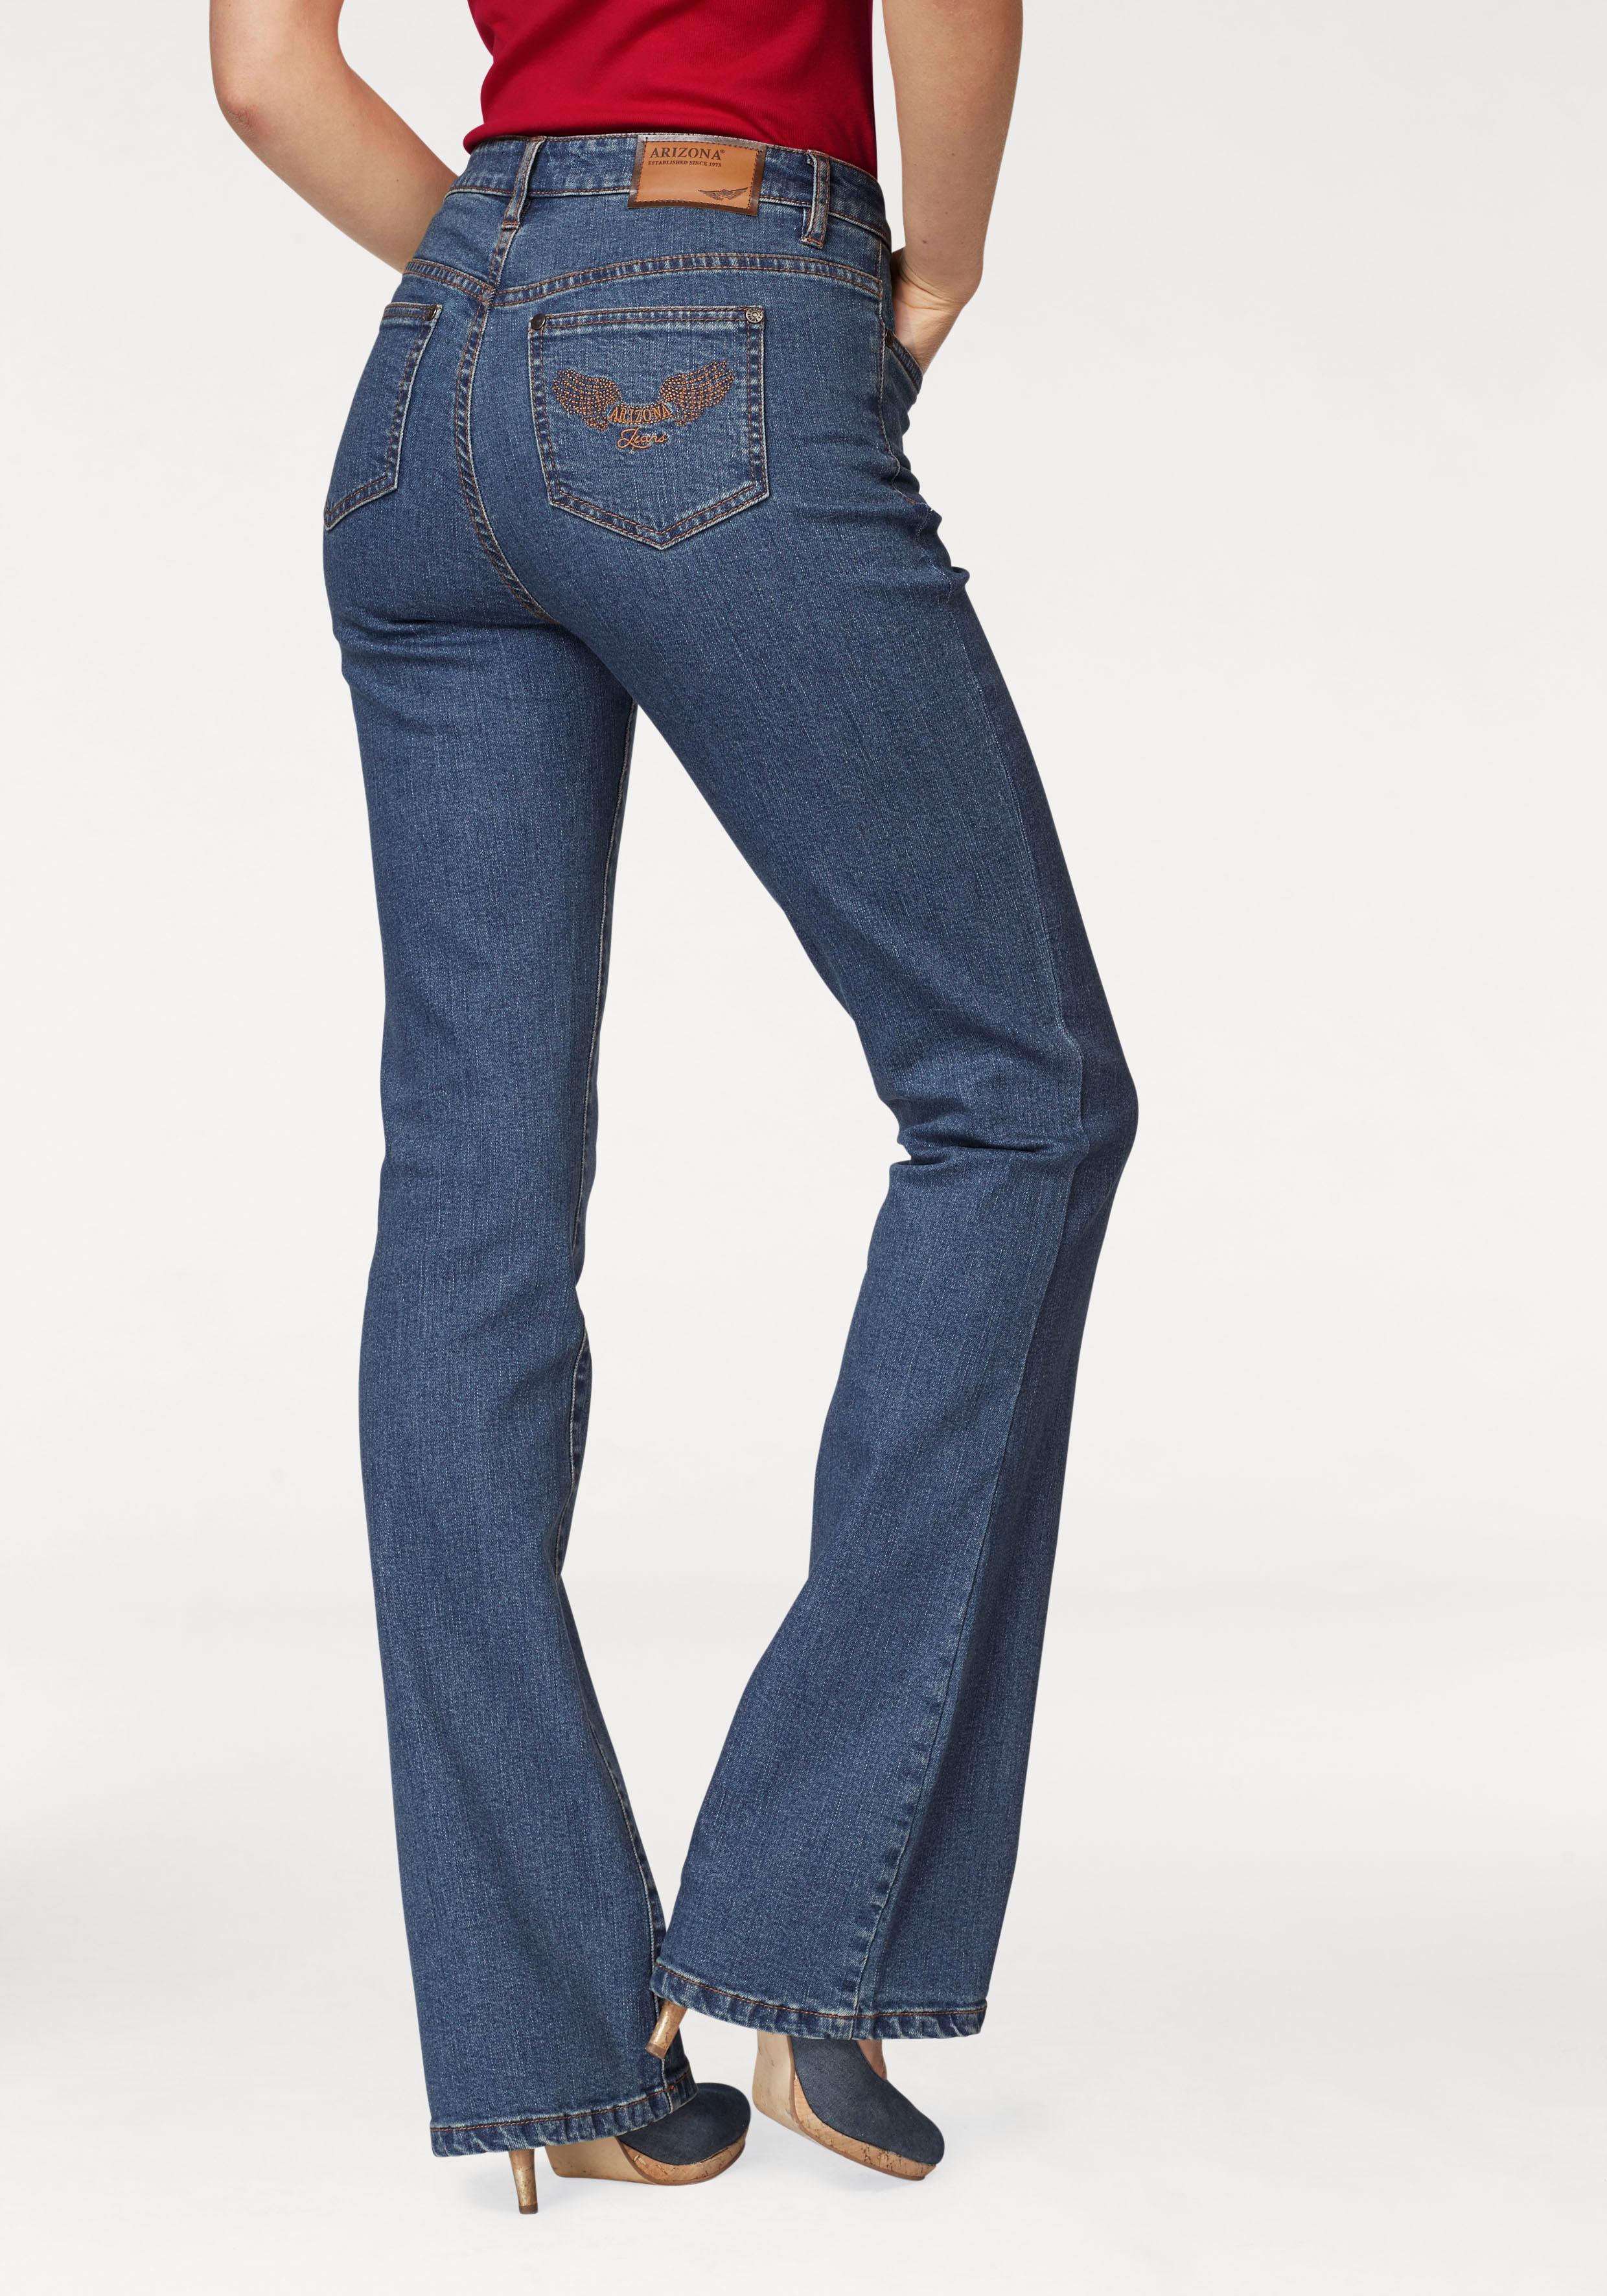 99659d6973 Arizona Bootcut-Jeans »Comfort-Fit« online kaufen | BAUR